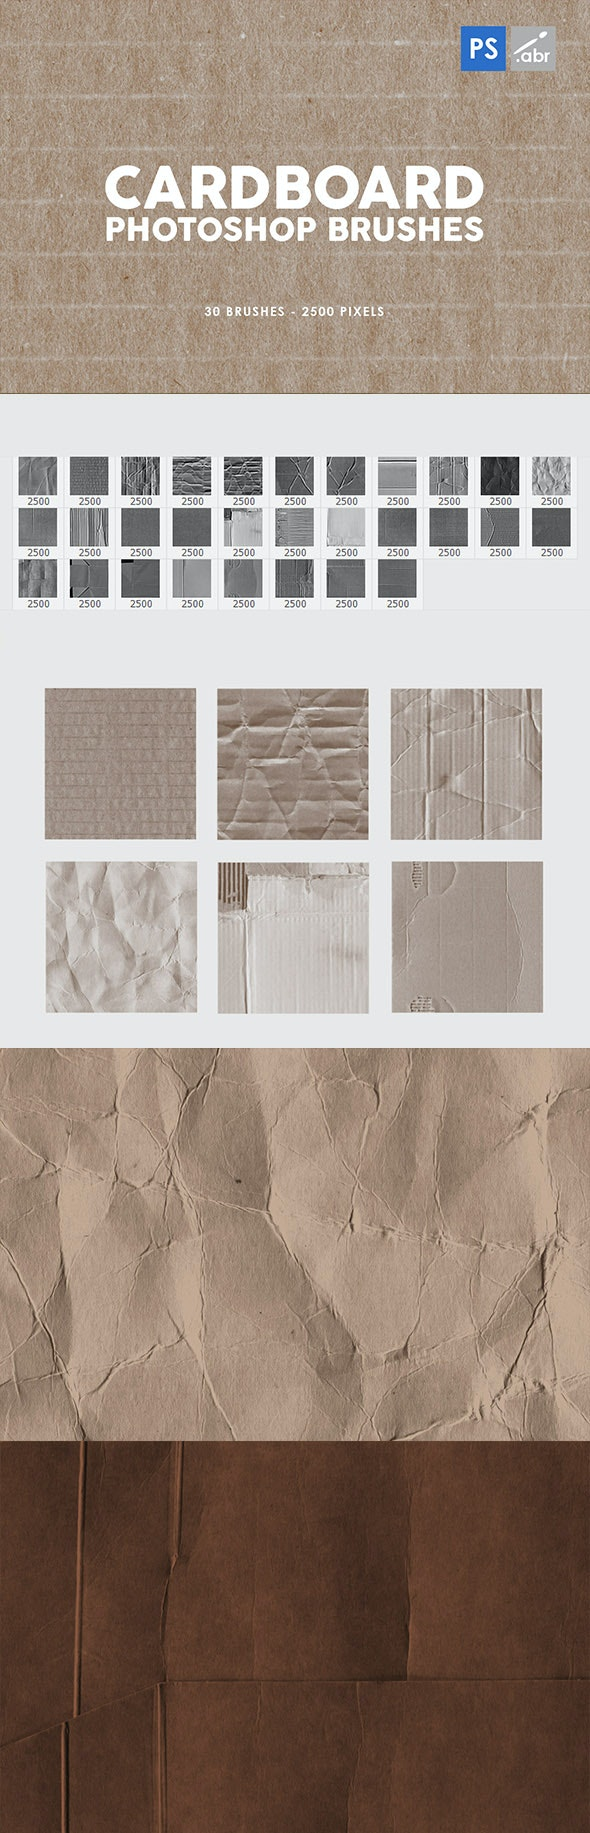 高质量艺术装饰30个纸板纹理印章ps笔刷下载designshidai_bishua046